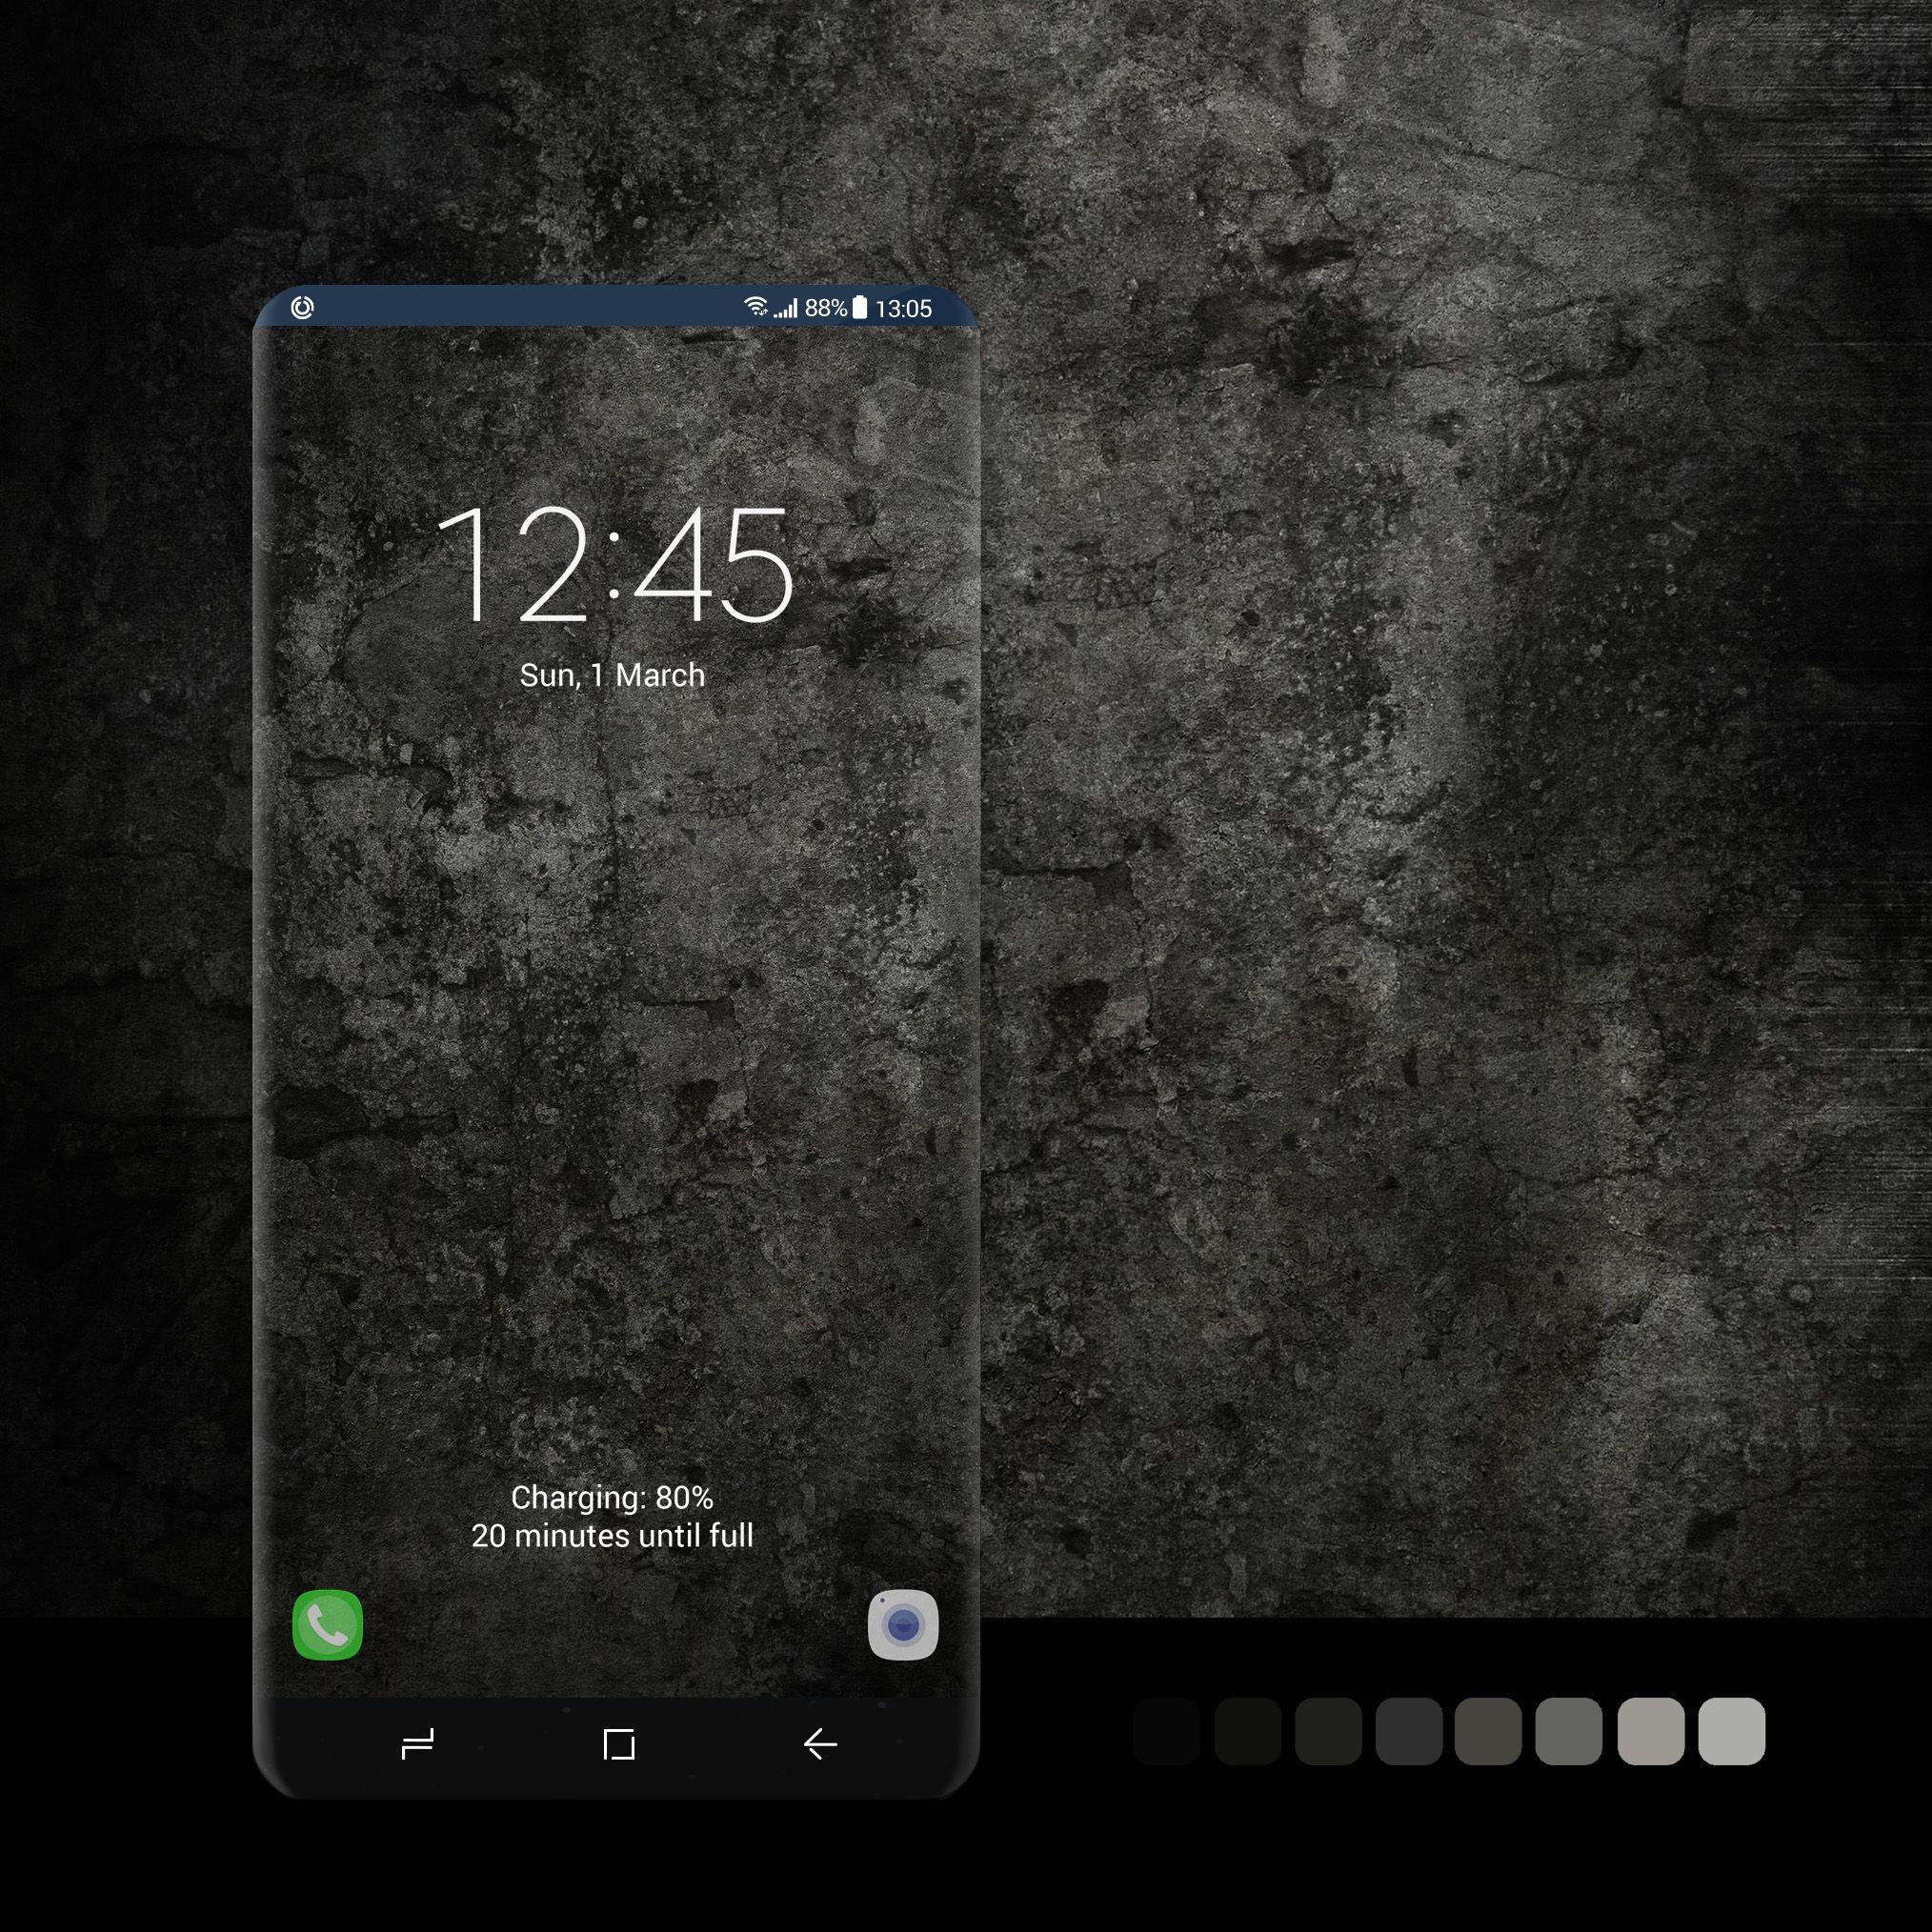 Pin By Adnan Haider On Samsung Galaxy Wallpaper Samsung Galaxy Wallpaper Galaxy Wallpaper Galaxy